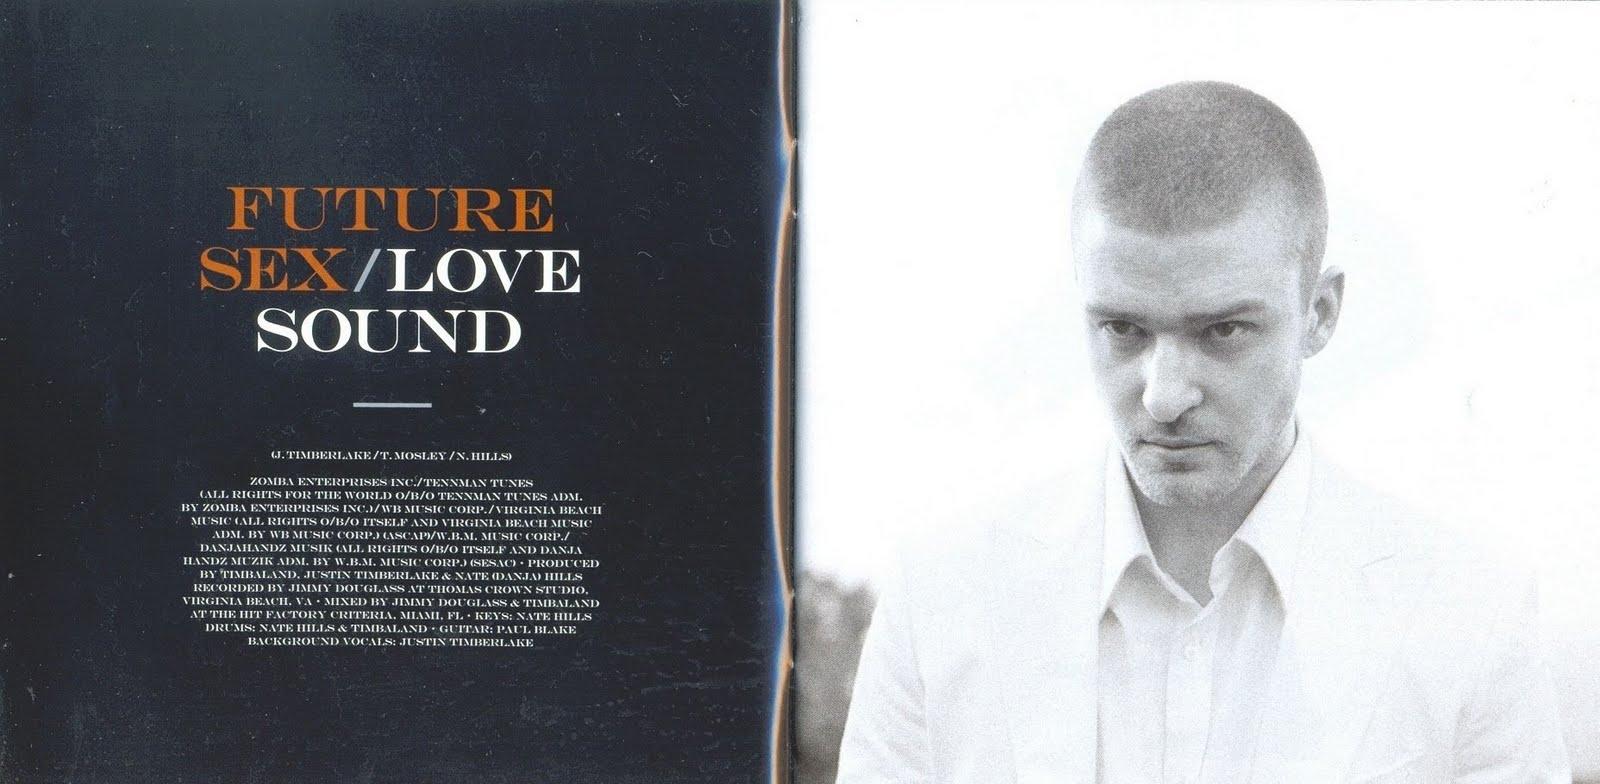 Justin timberlake futrure sex love sounds